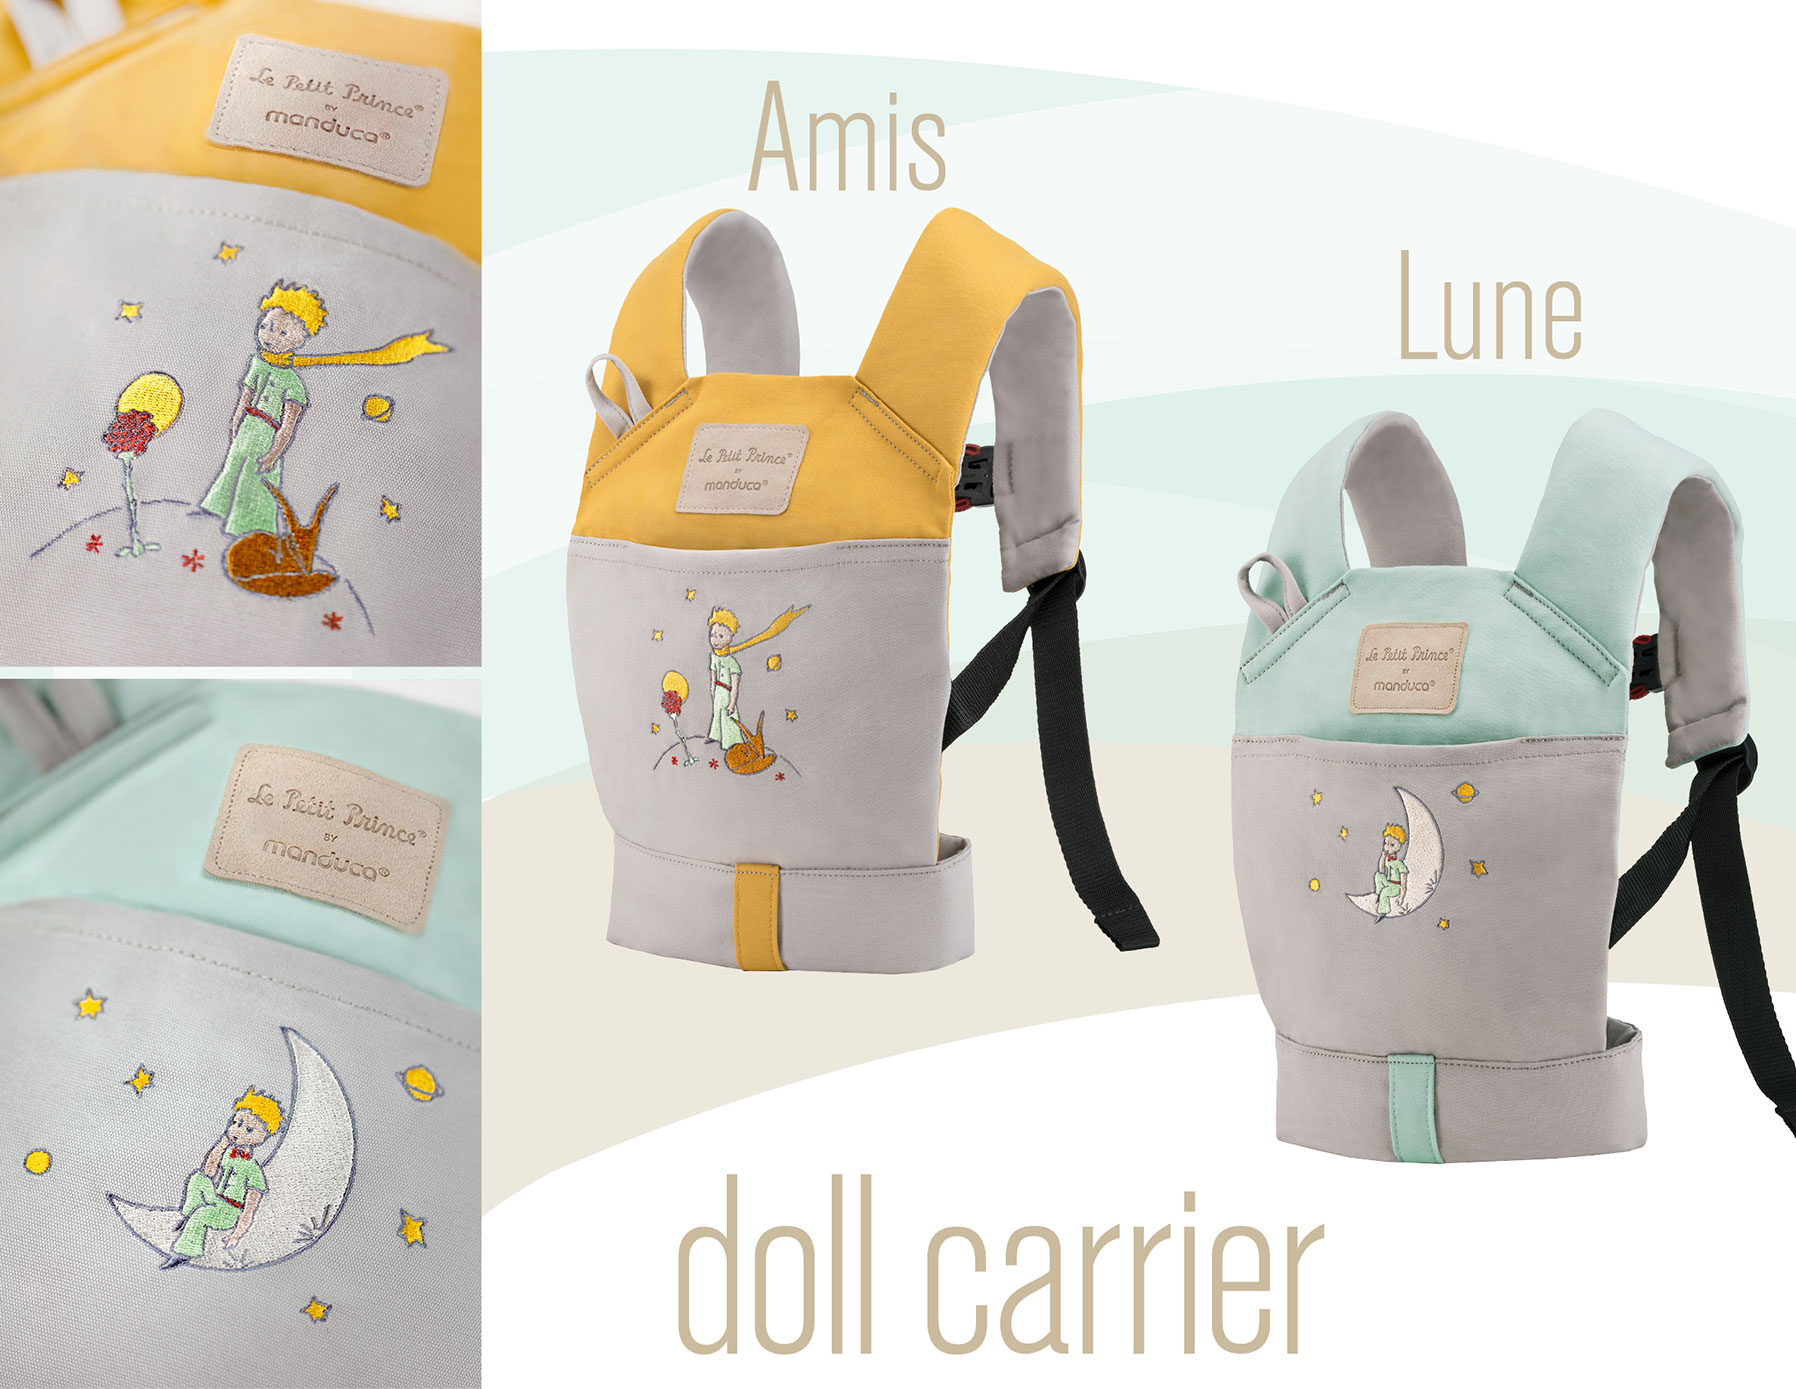 Le Petit Prince DollCarrier Amis & Lune